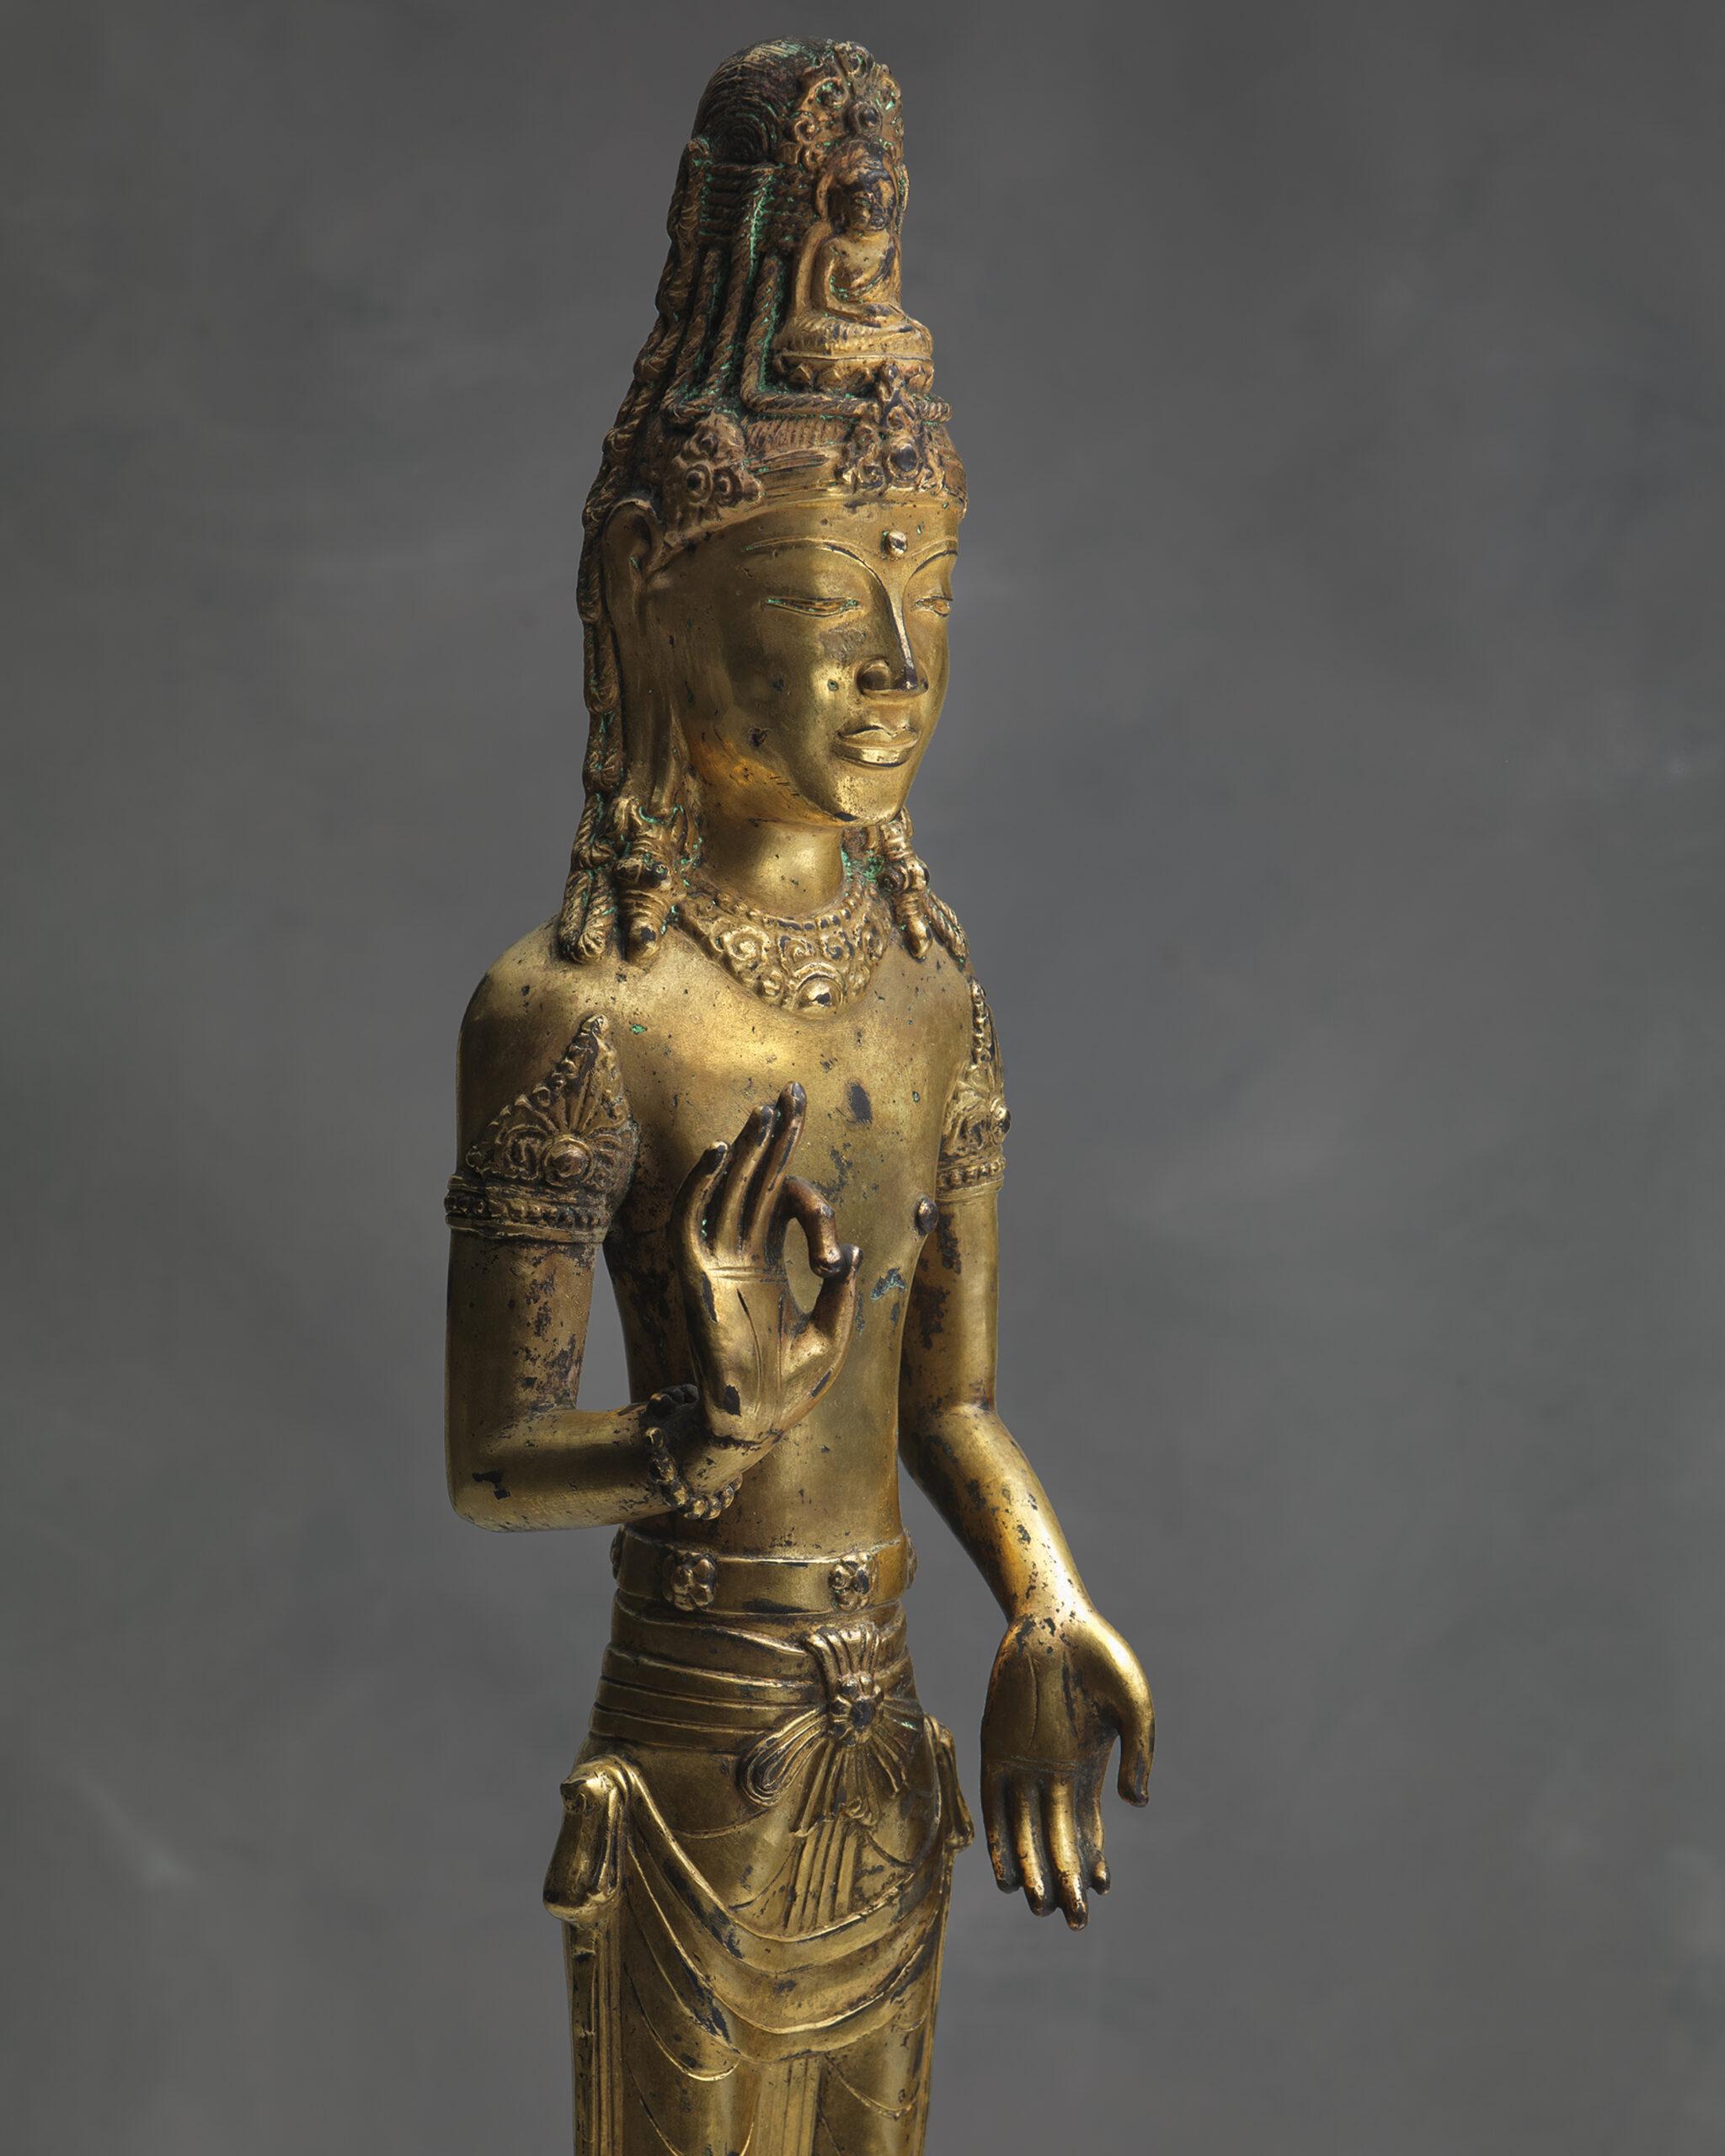 ESKENAZI LTD. A Gilt-bronze Standing Figure of an Acuoye Guanyin Yunnan, Dali Kingdom, 12th century Height: 45.7cm